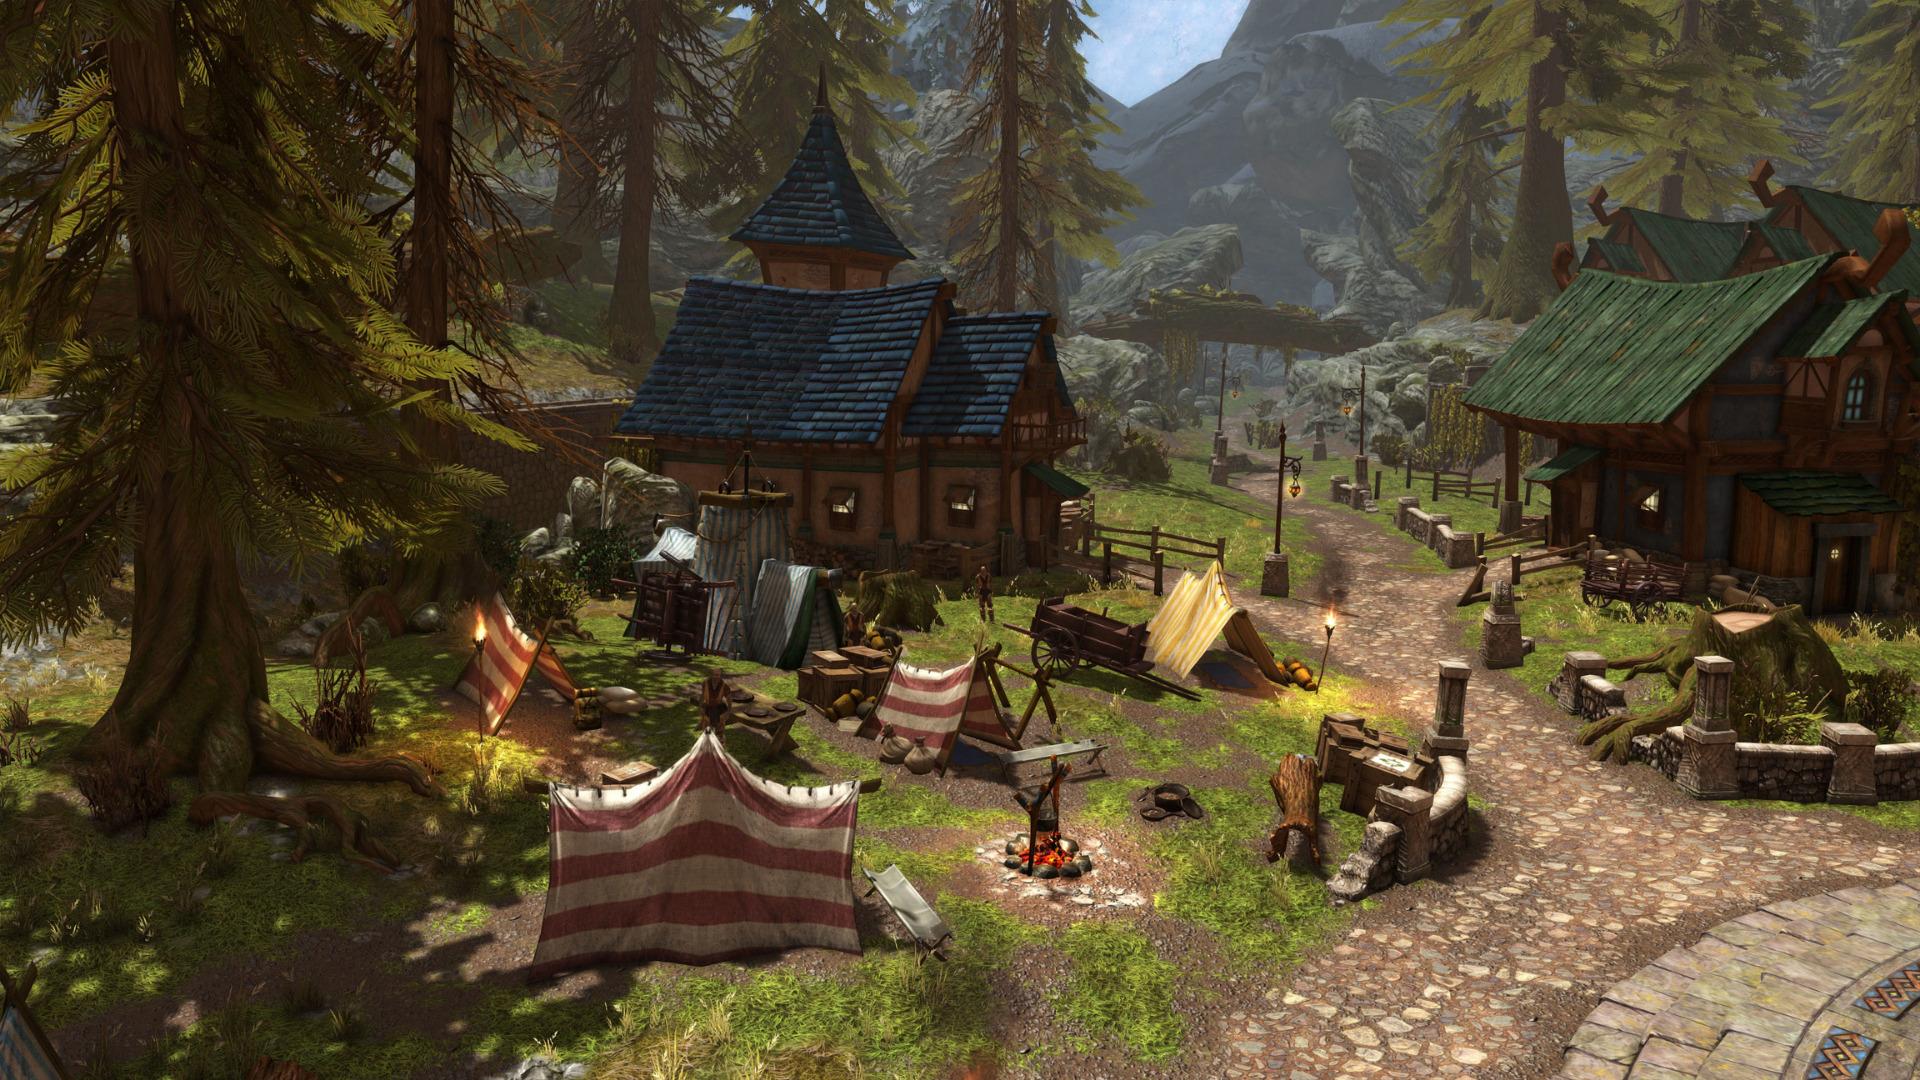 Kingdoms of Amalur DLC First Look